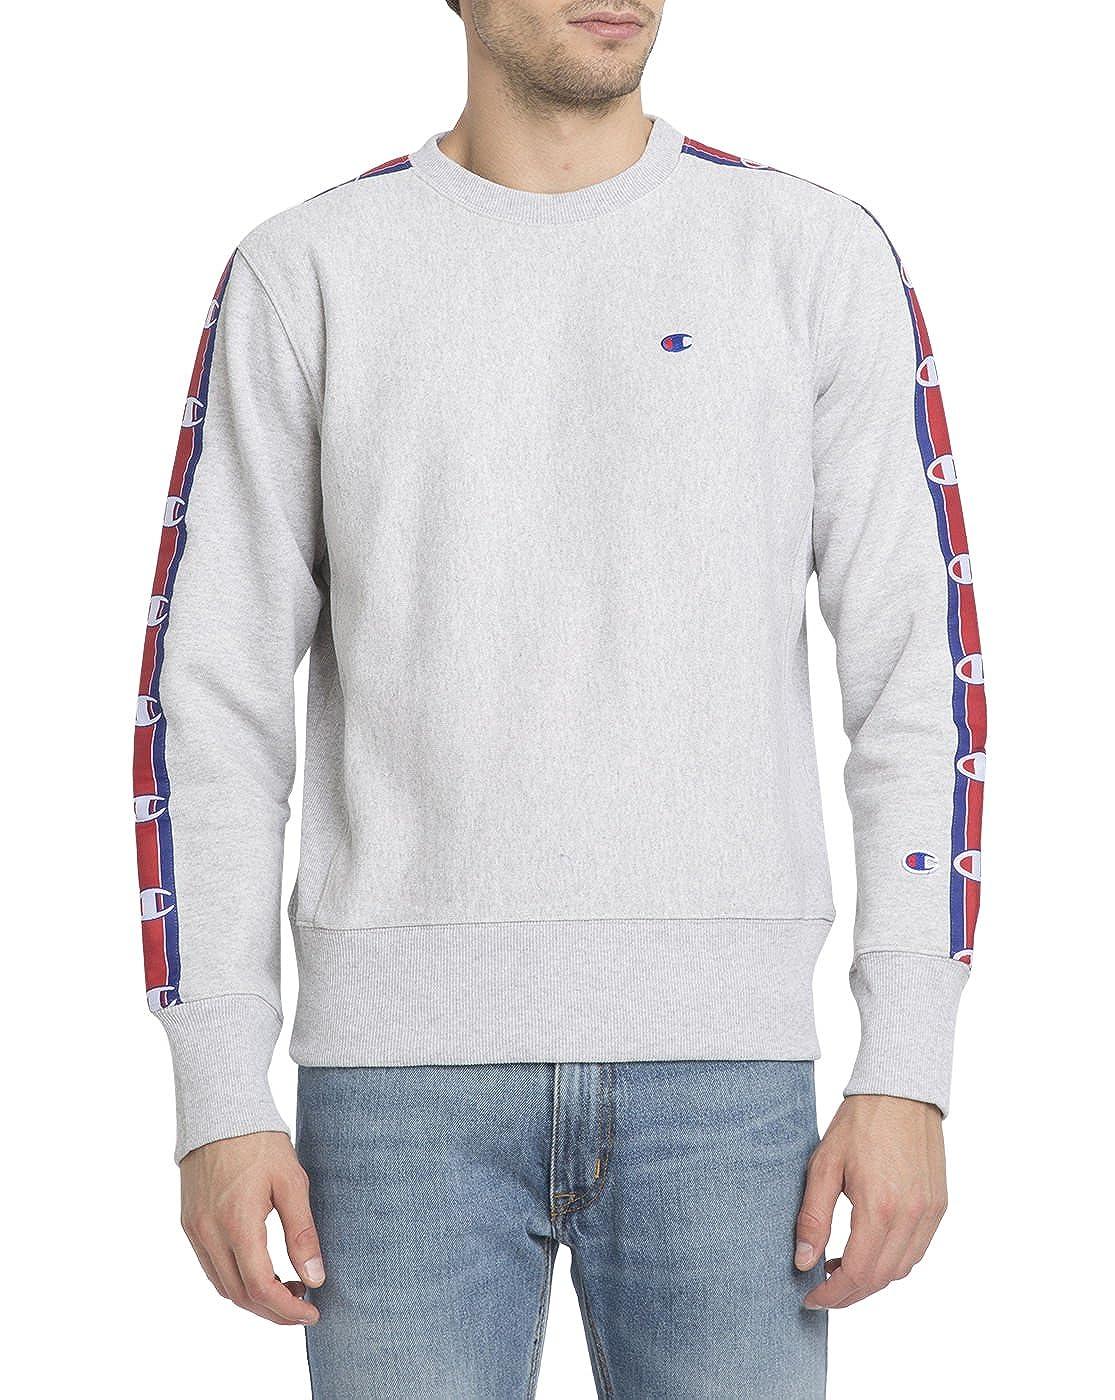 c0f22a8cb804 Champion - Crew-Neck Sweatshirts - Men - Mottled-Grey Stripes Logo  Sweatshirt for Men - S: Amazon.co.uk: Clothing